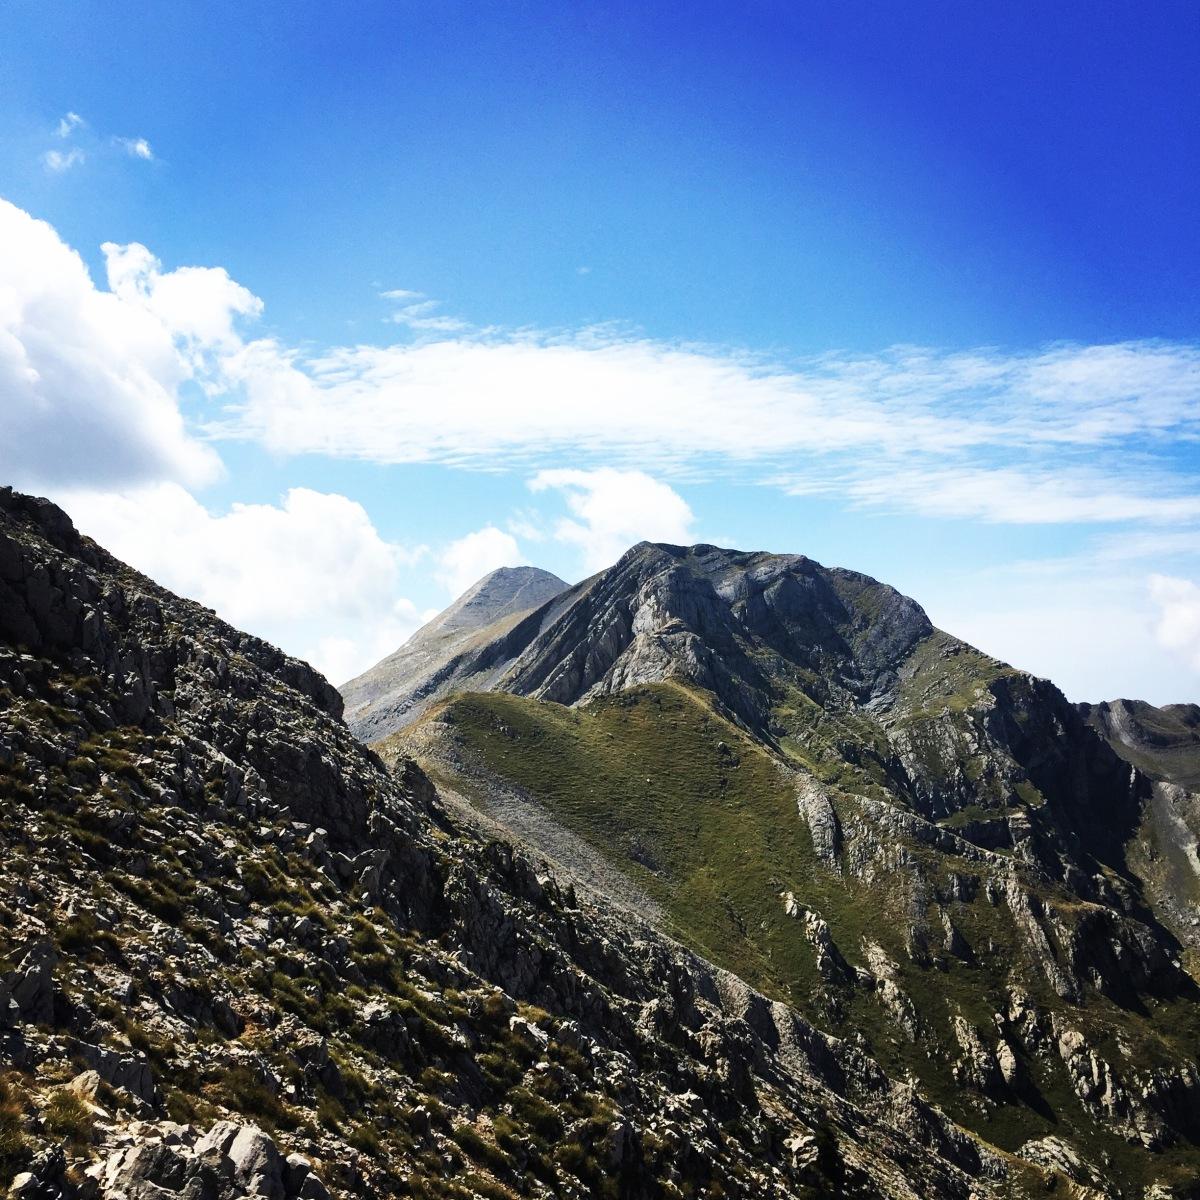 Taygetus Mountain Crossing Pentadaktylos (Five Fingers) - Anavriti - Tsarkos - Spanakaki - Sidirokastro - Athanati Rachi - Profitis Elias - EOS Refuge